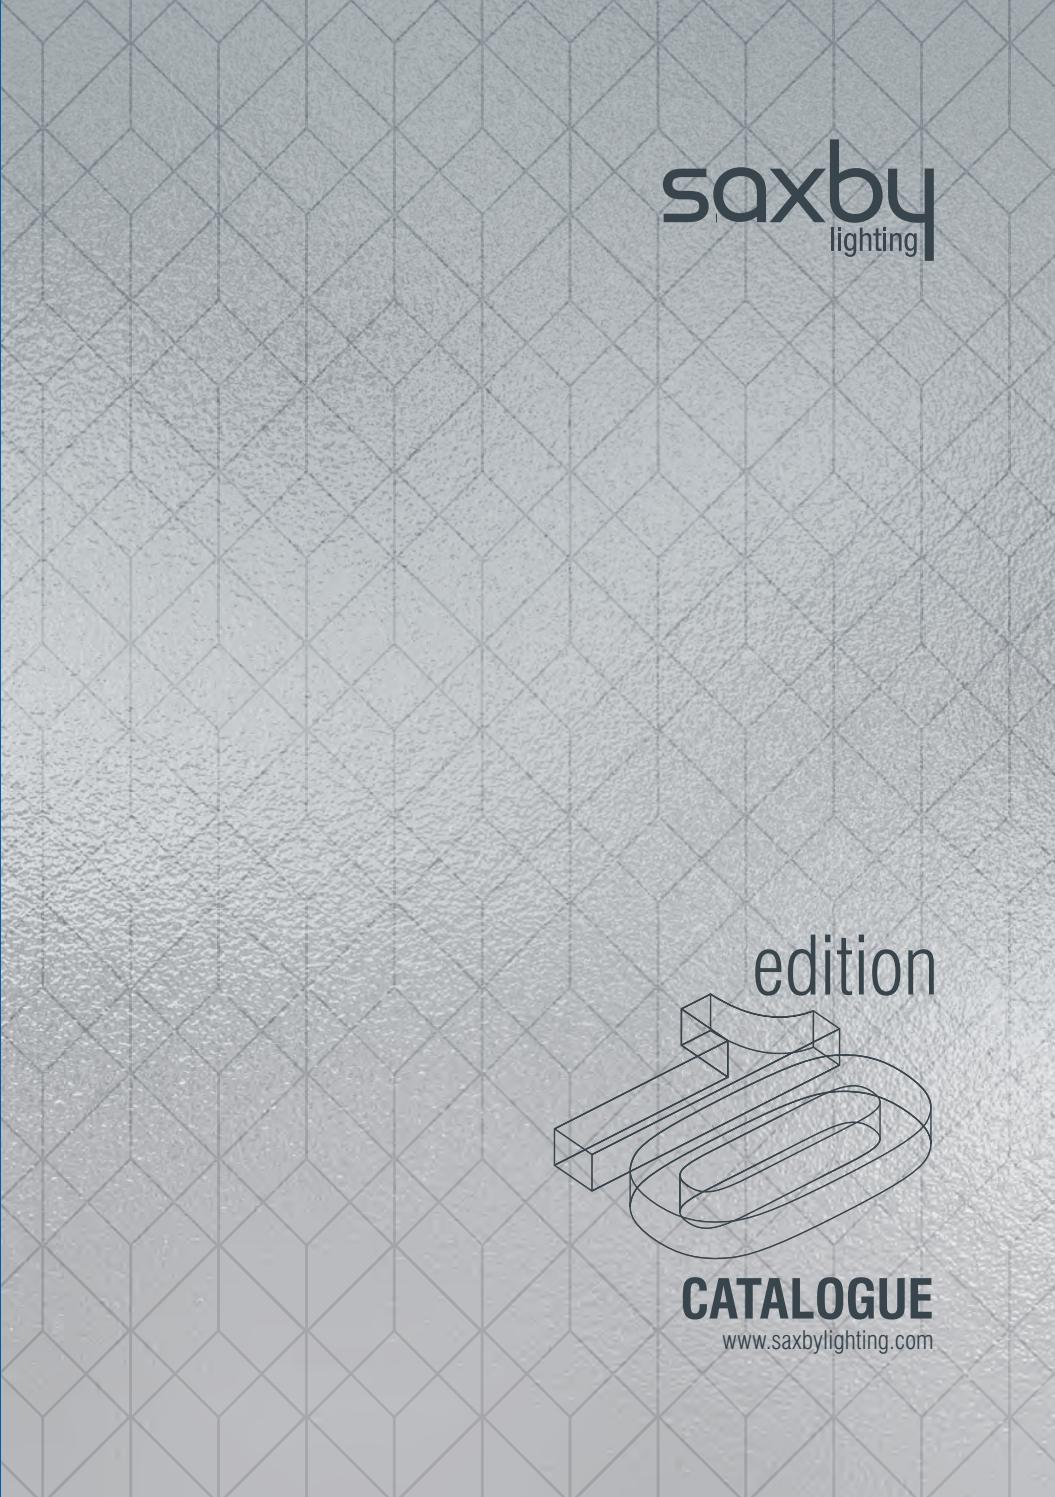 Saxby Lighting Edition 10 By Saxby Lighting Issuu